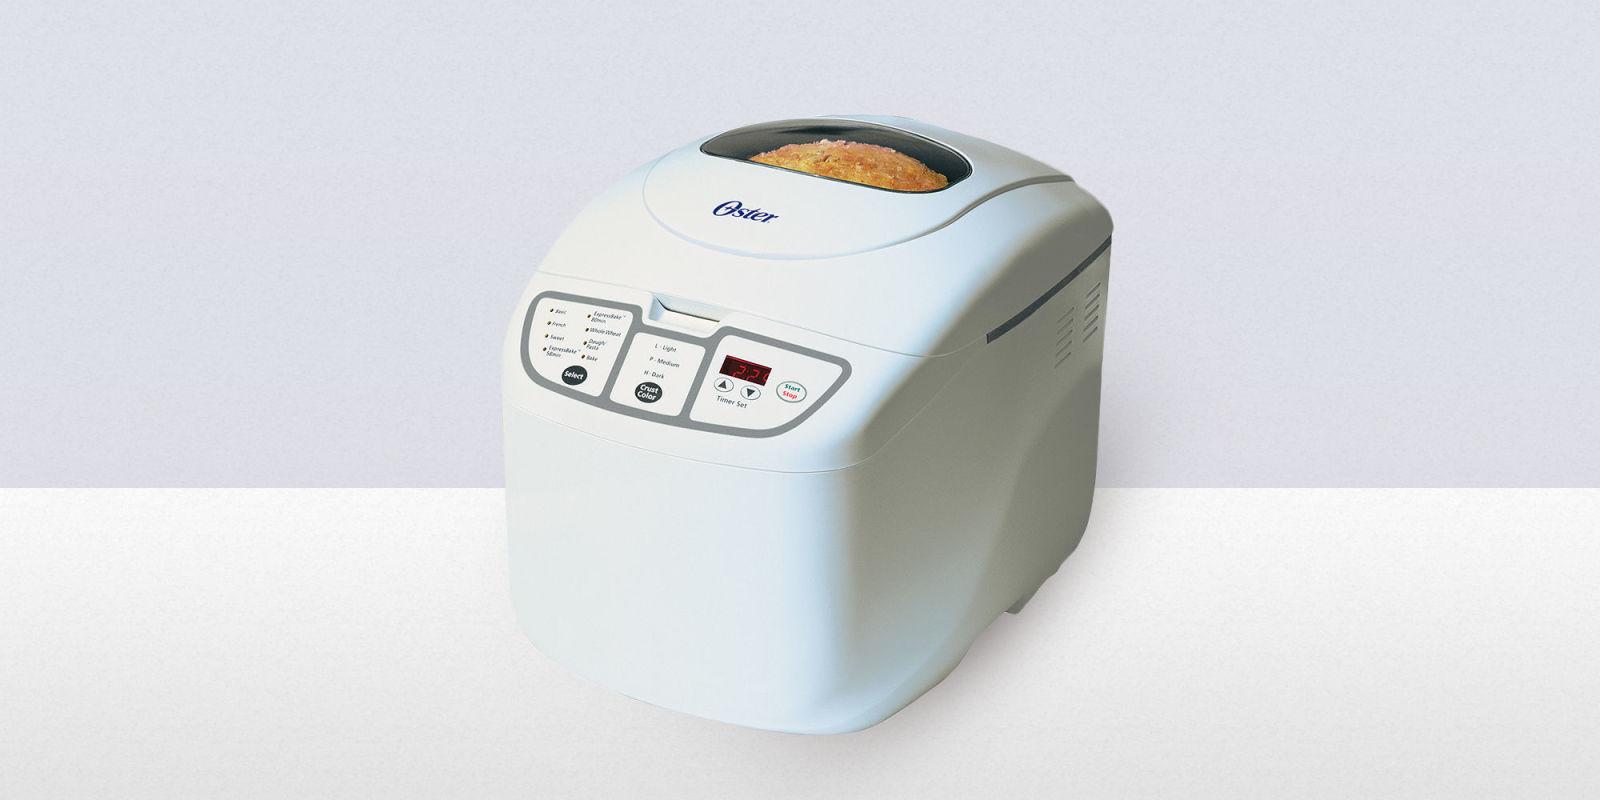 Top Brand Kitchen Appliances Cookware Reviews Best Kitchen Appliances And Gadgets